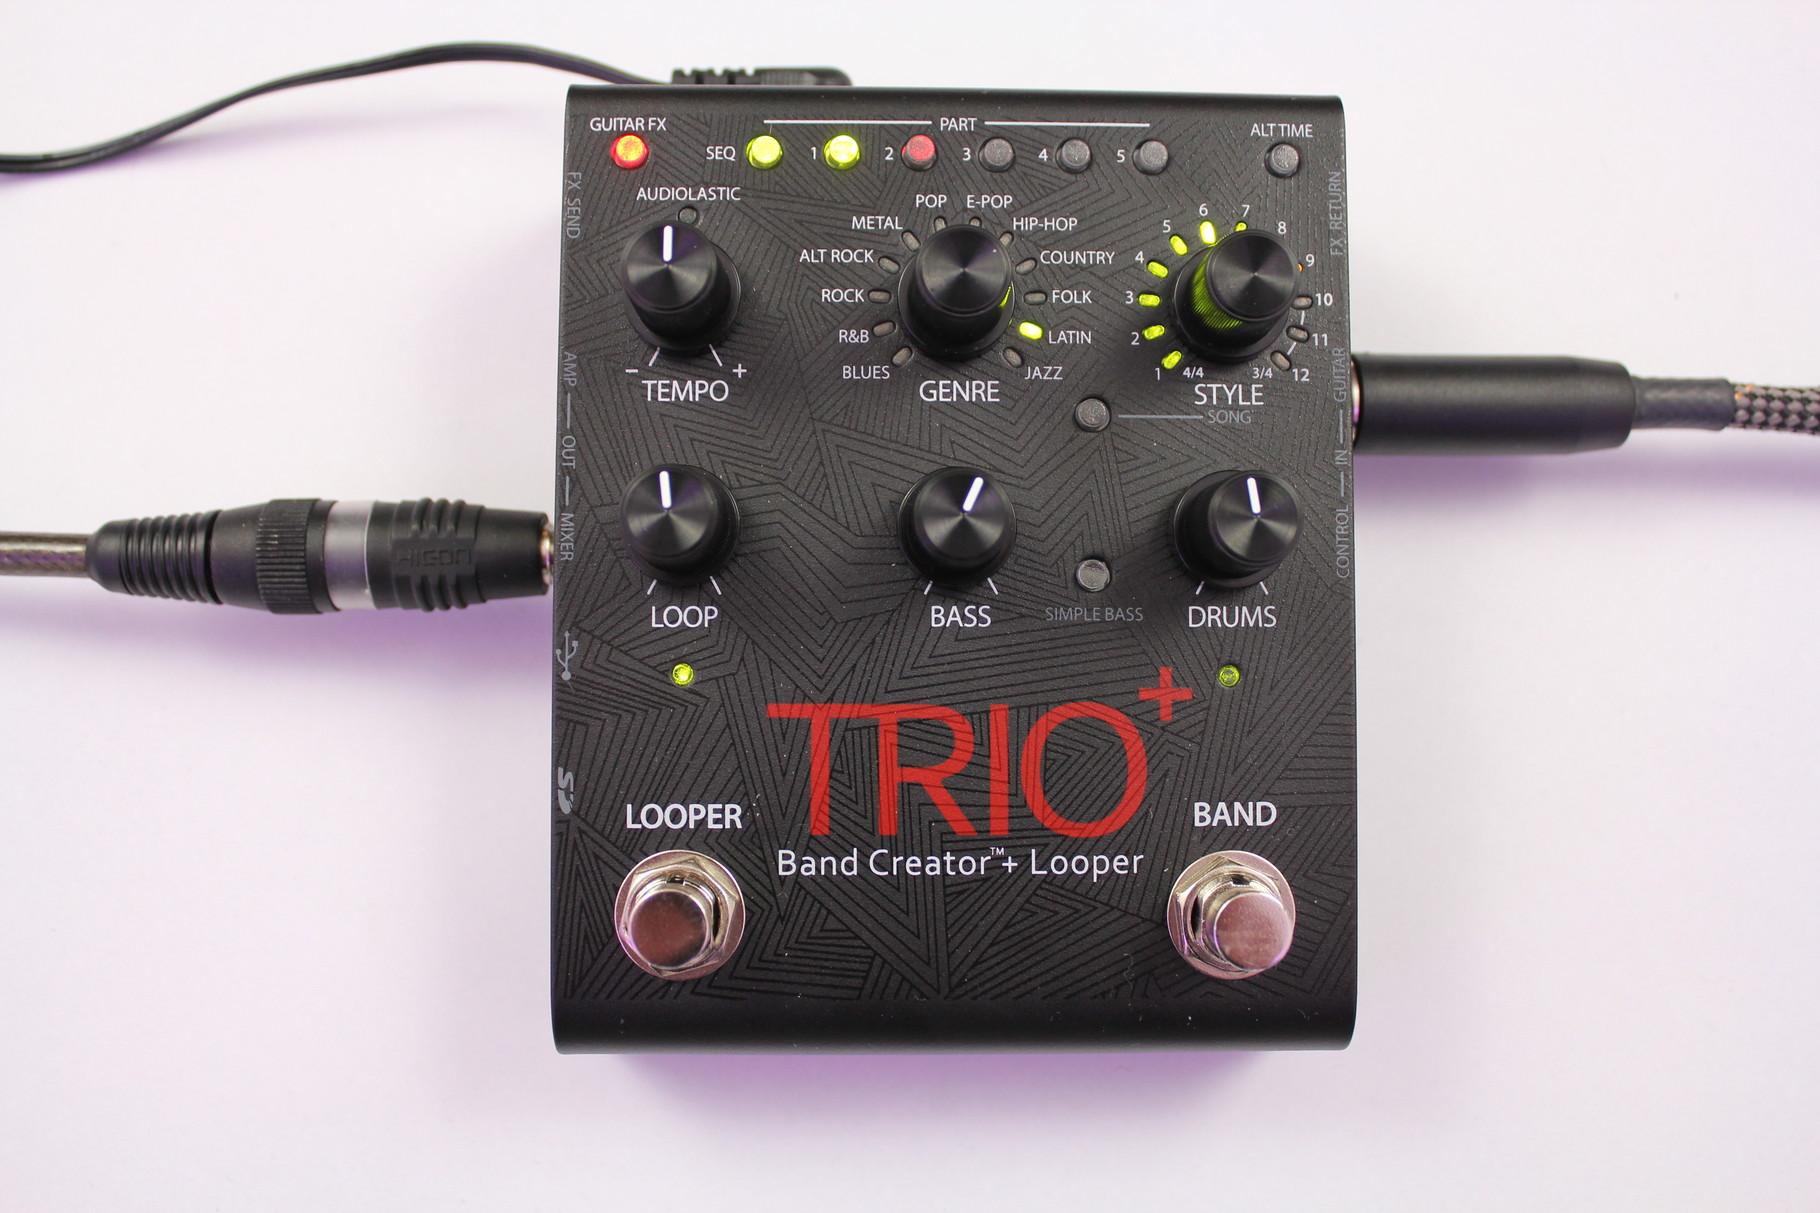 Digitech Trio+ Bandcreator with Looper